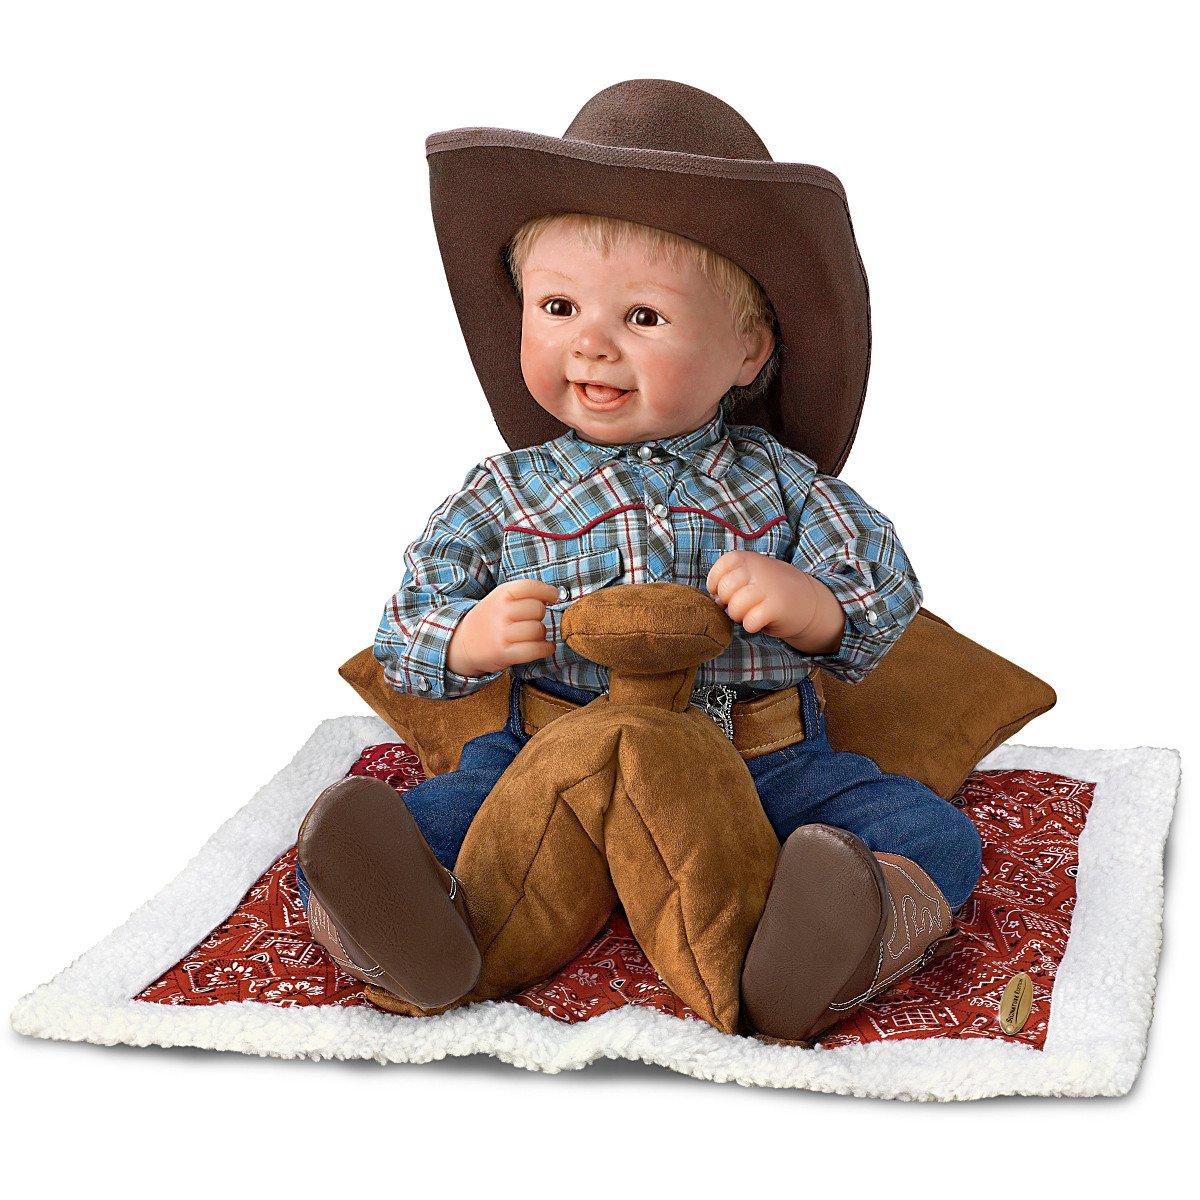 18'' Sherry Rawn Baby Cowboy Doll with Saddle Display by The Ashton-Drake Galleries by The Ashton-Drake Galleries